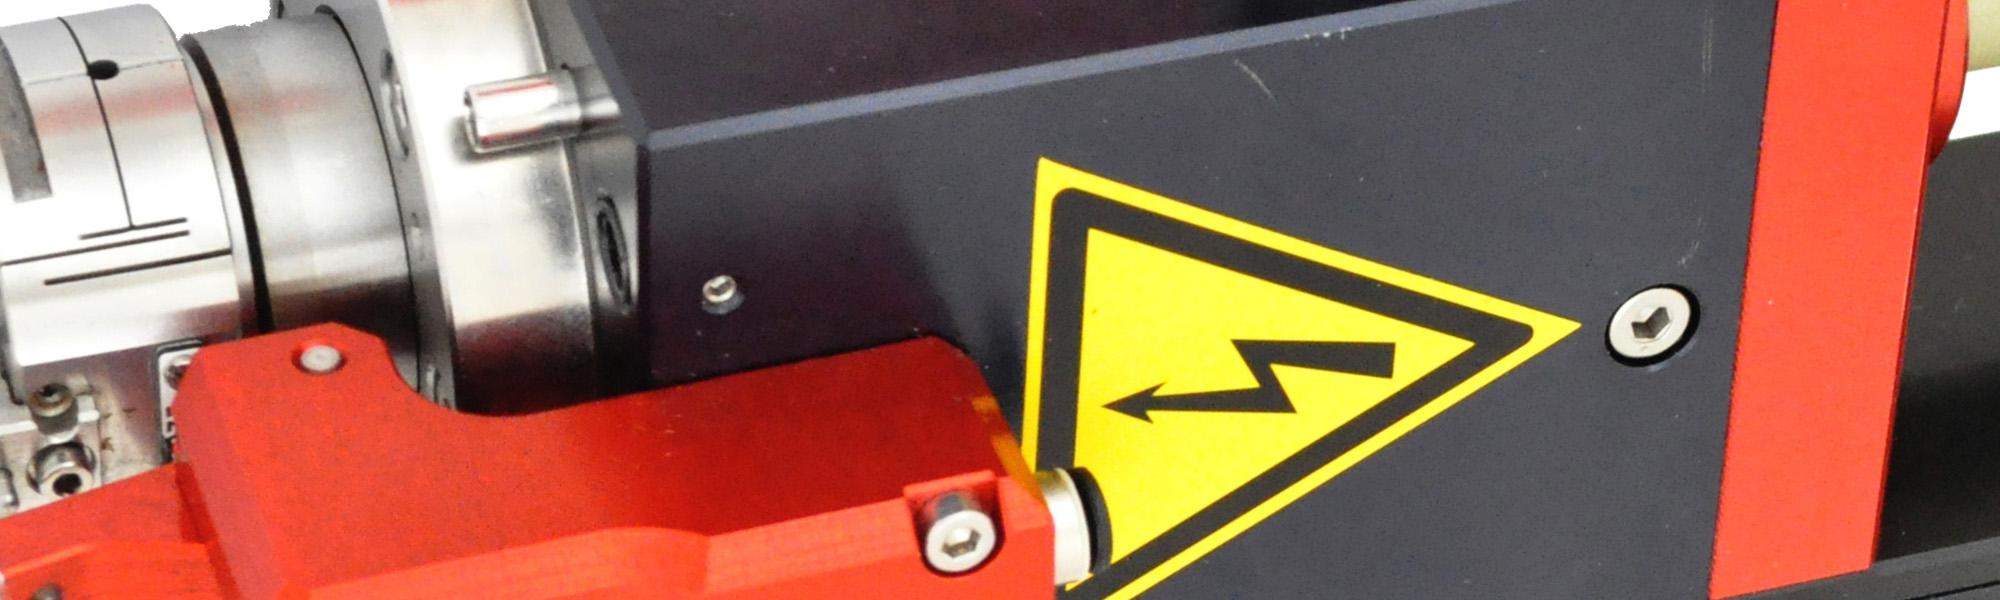 Options_electrodechanger